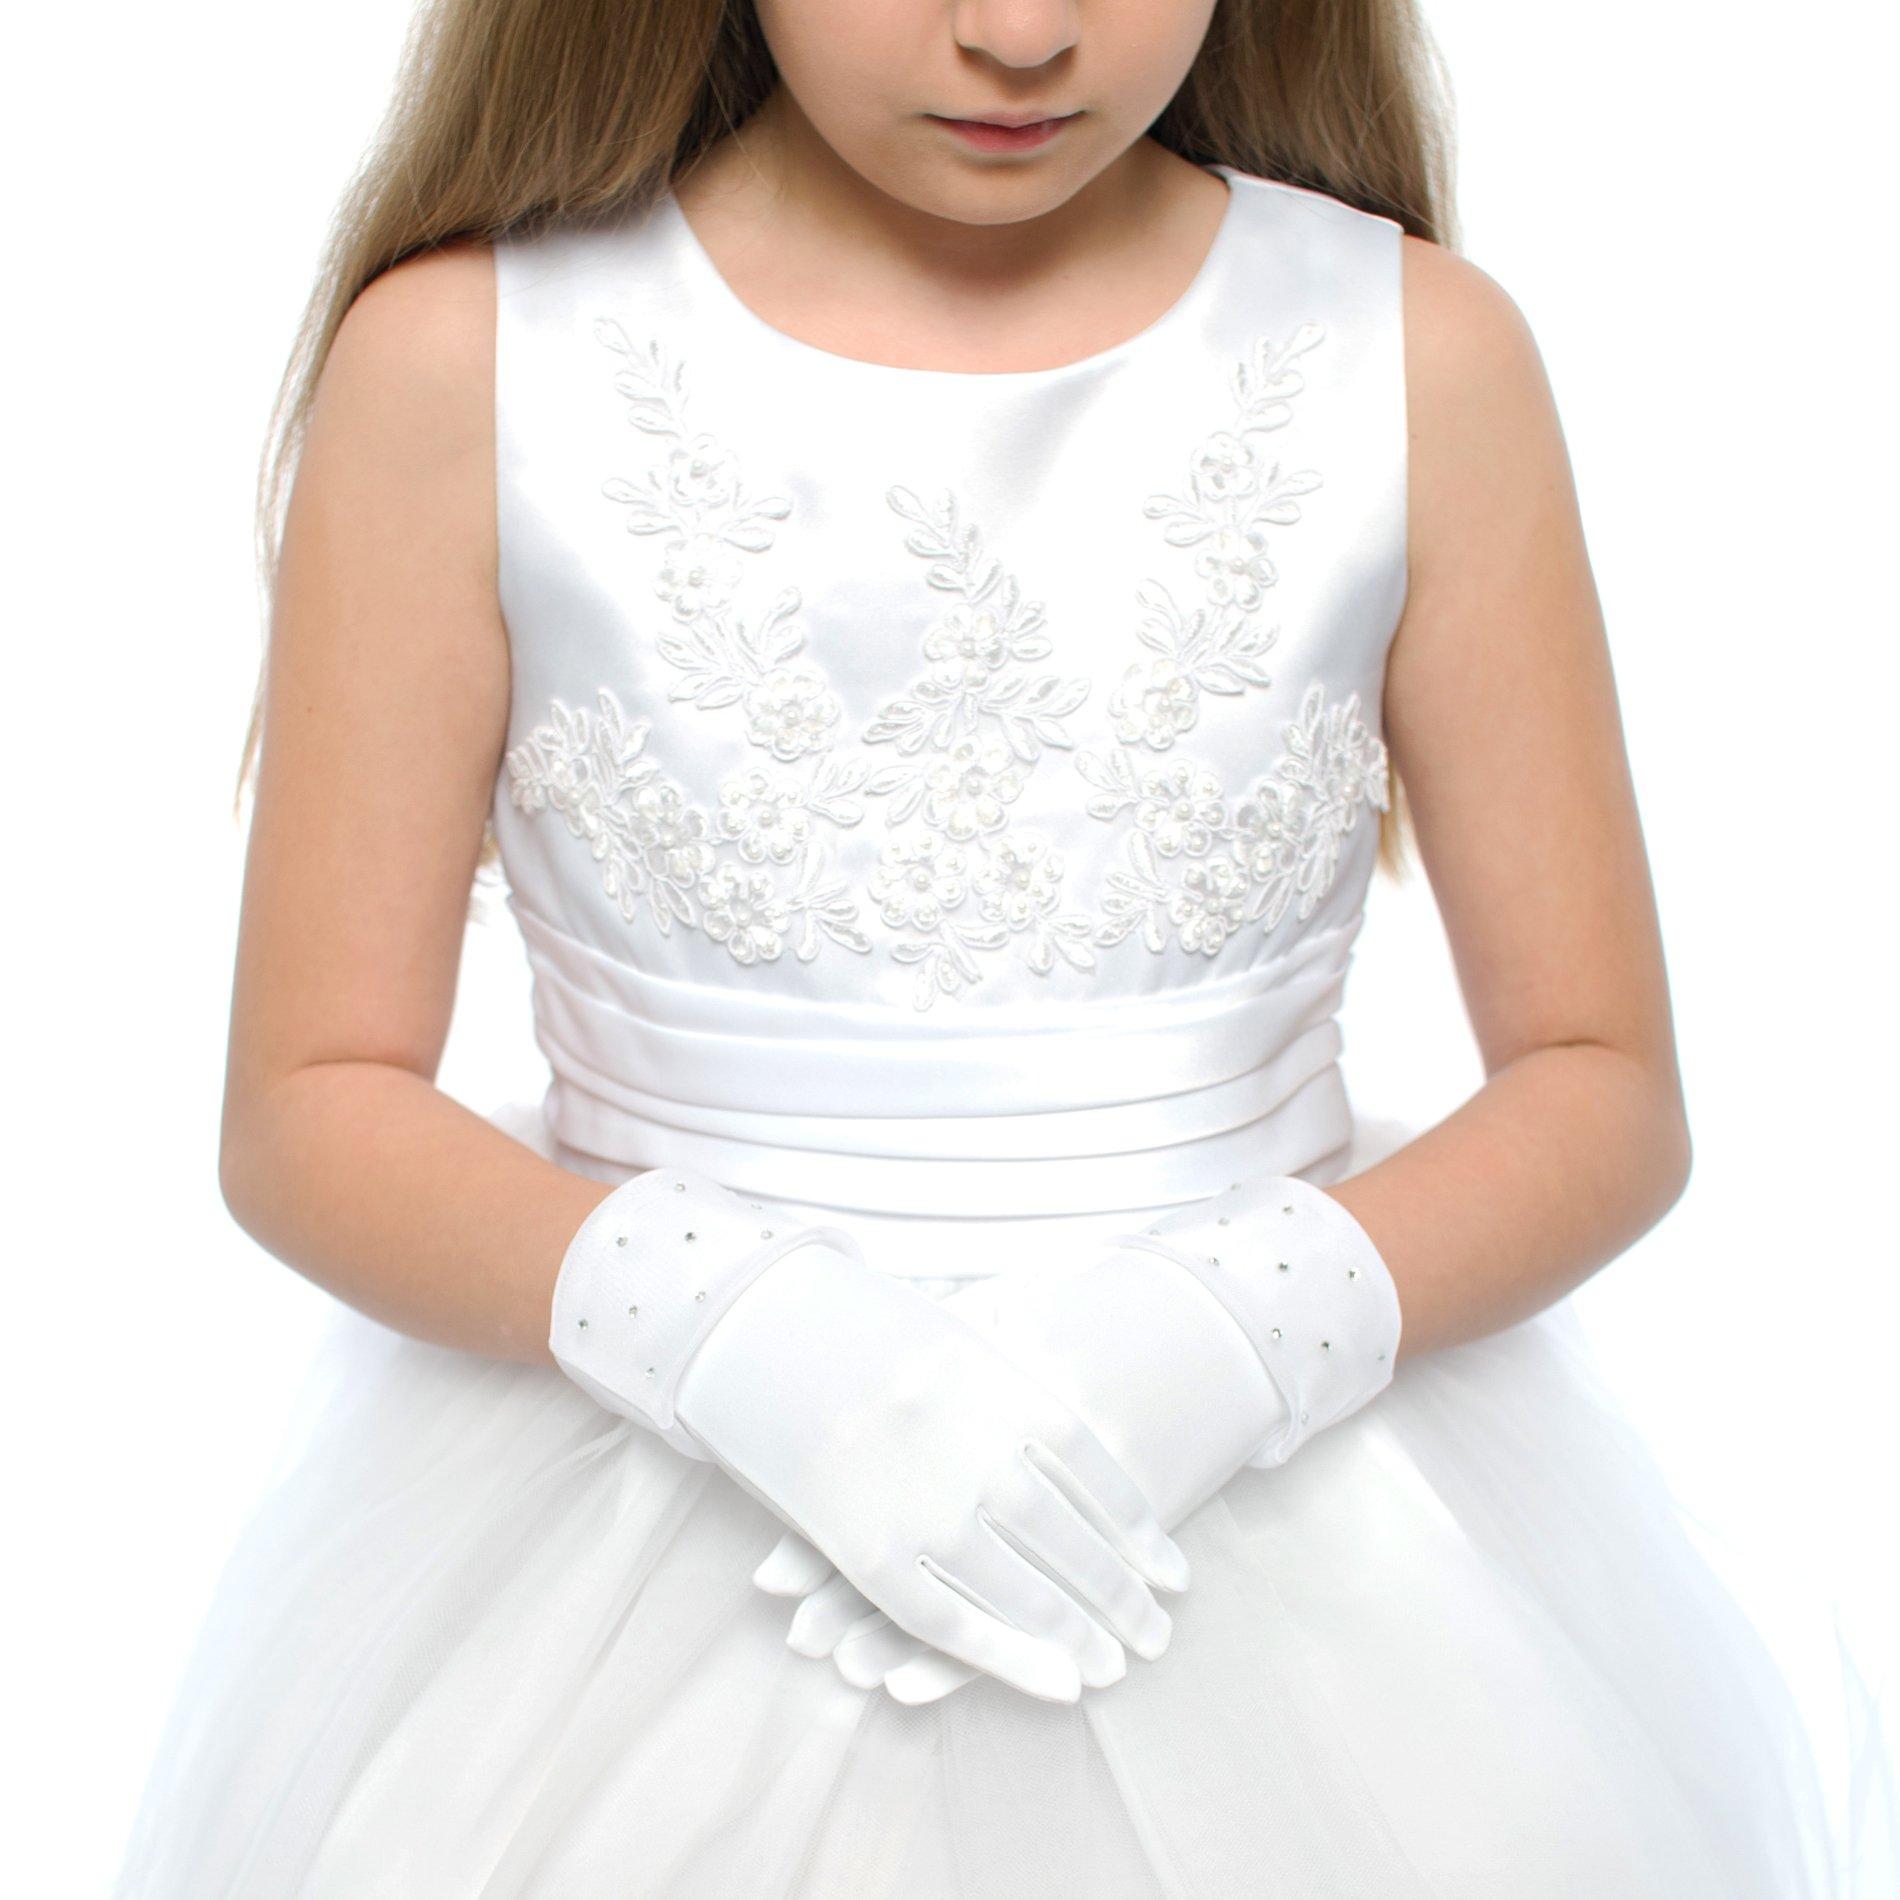 DressForLess Lovely Rhinestones Lace First Communion Girls Glove, White, 8-14, (TT-RSG-WT-8)